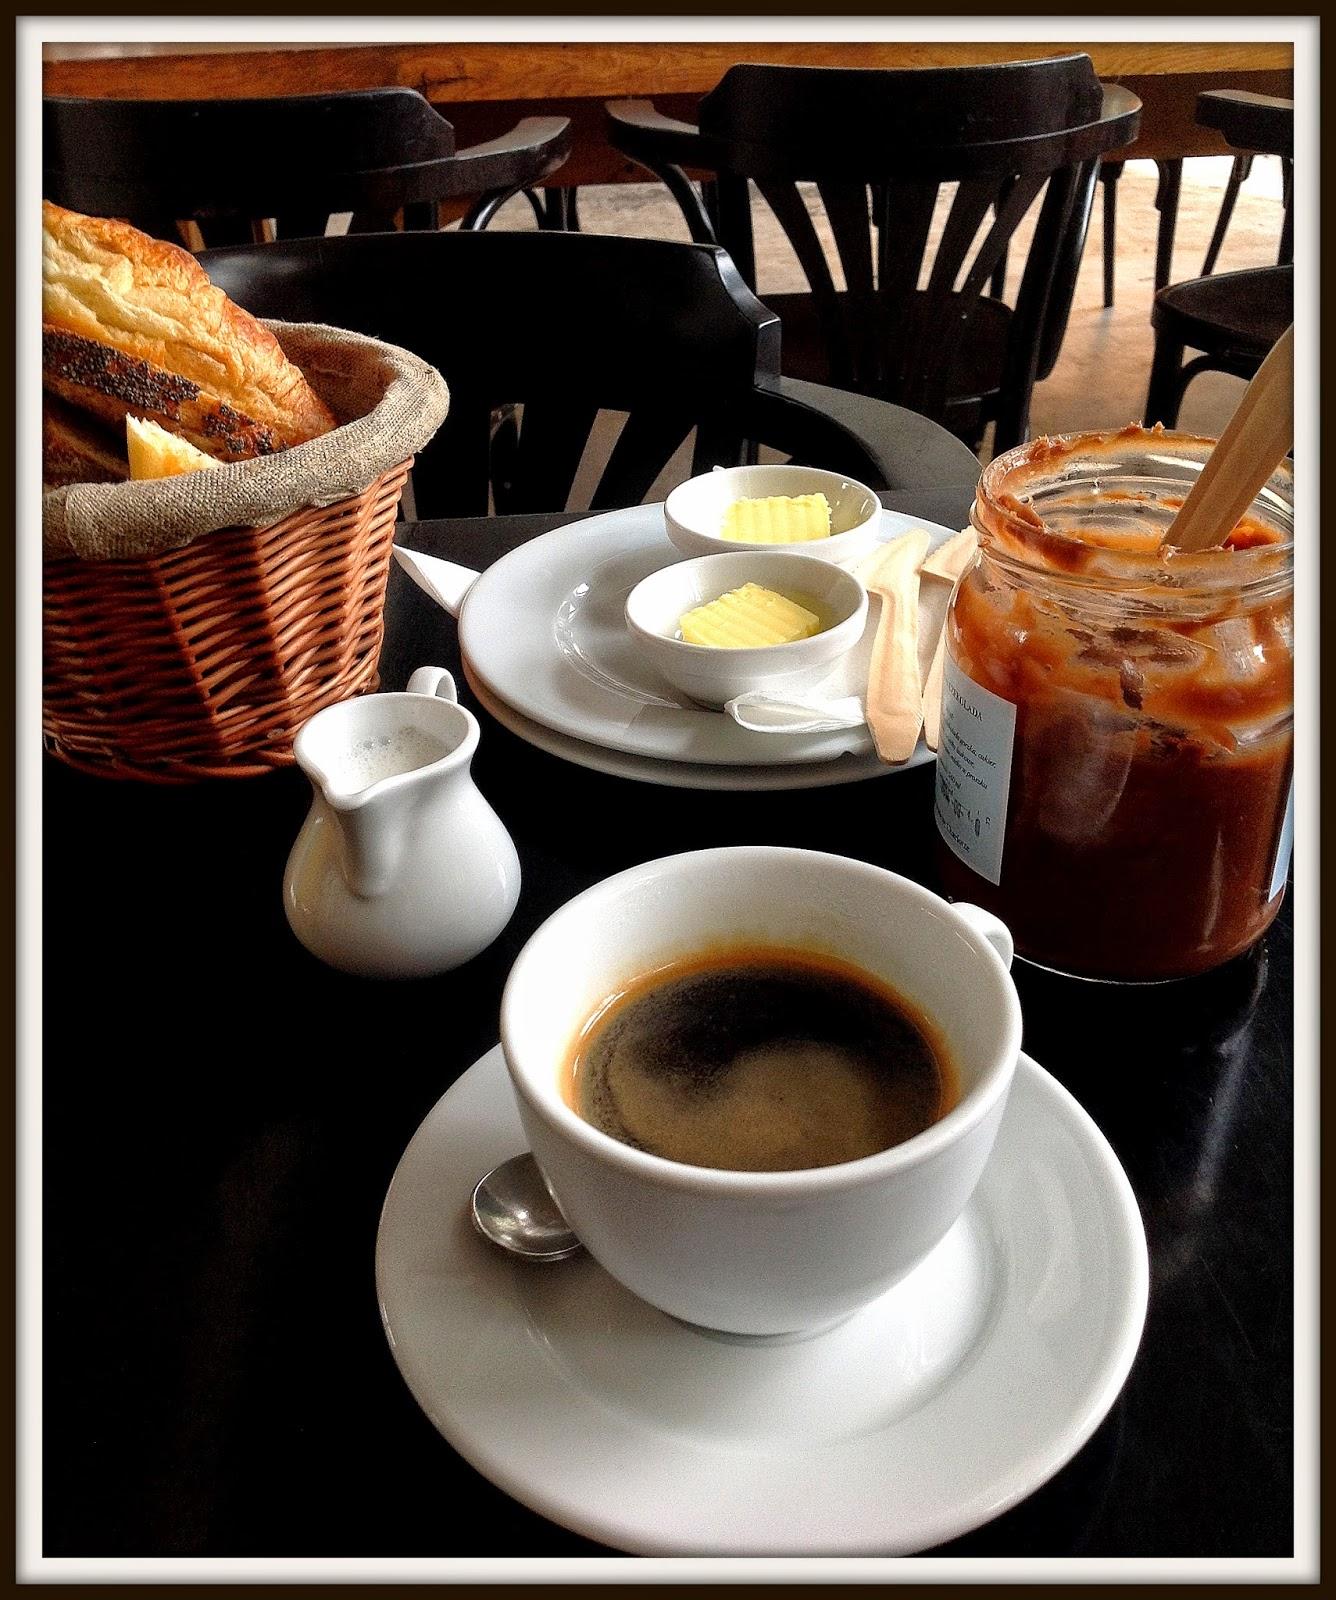 Charlotte Kraków, śniadanie, śniadanie Charlotte, śniadanie francuskie